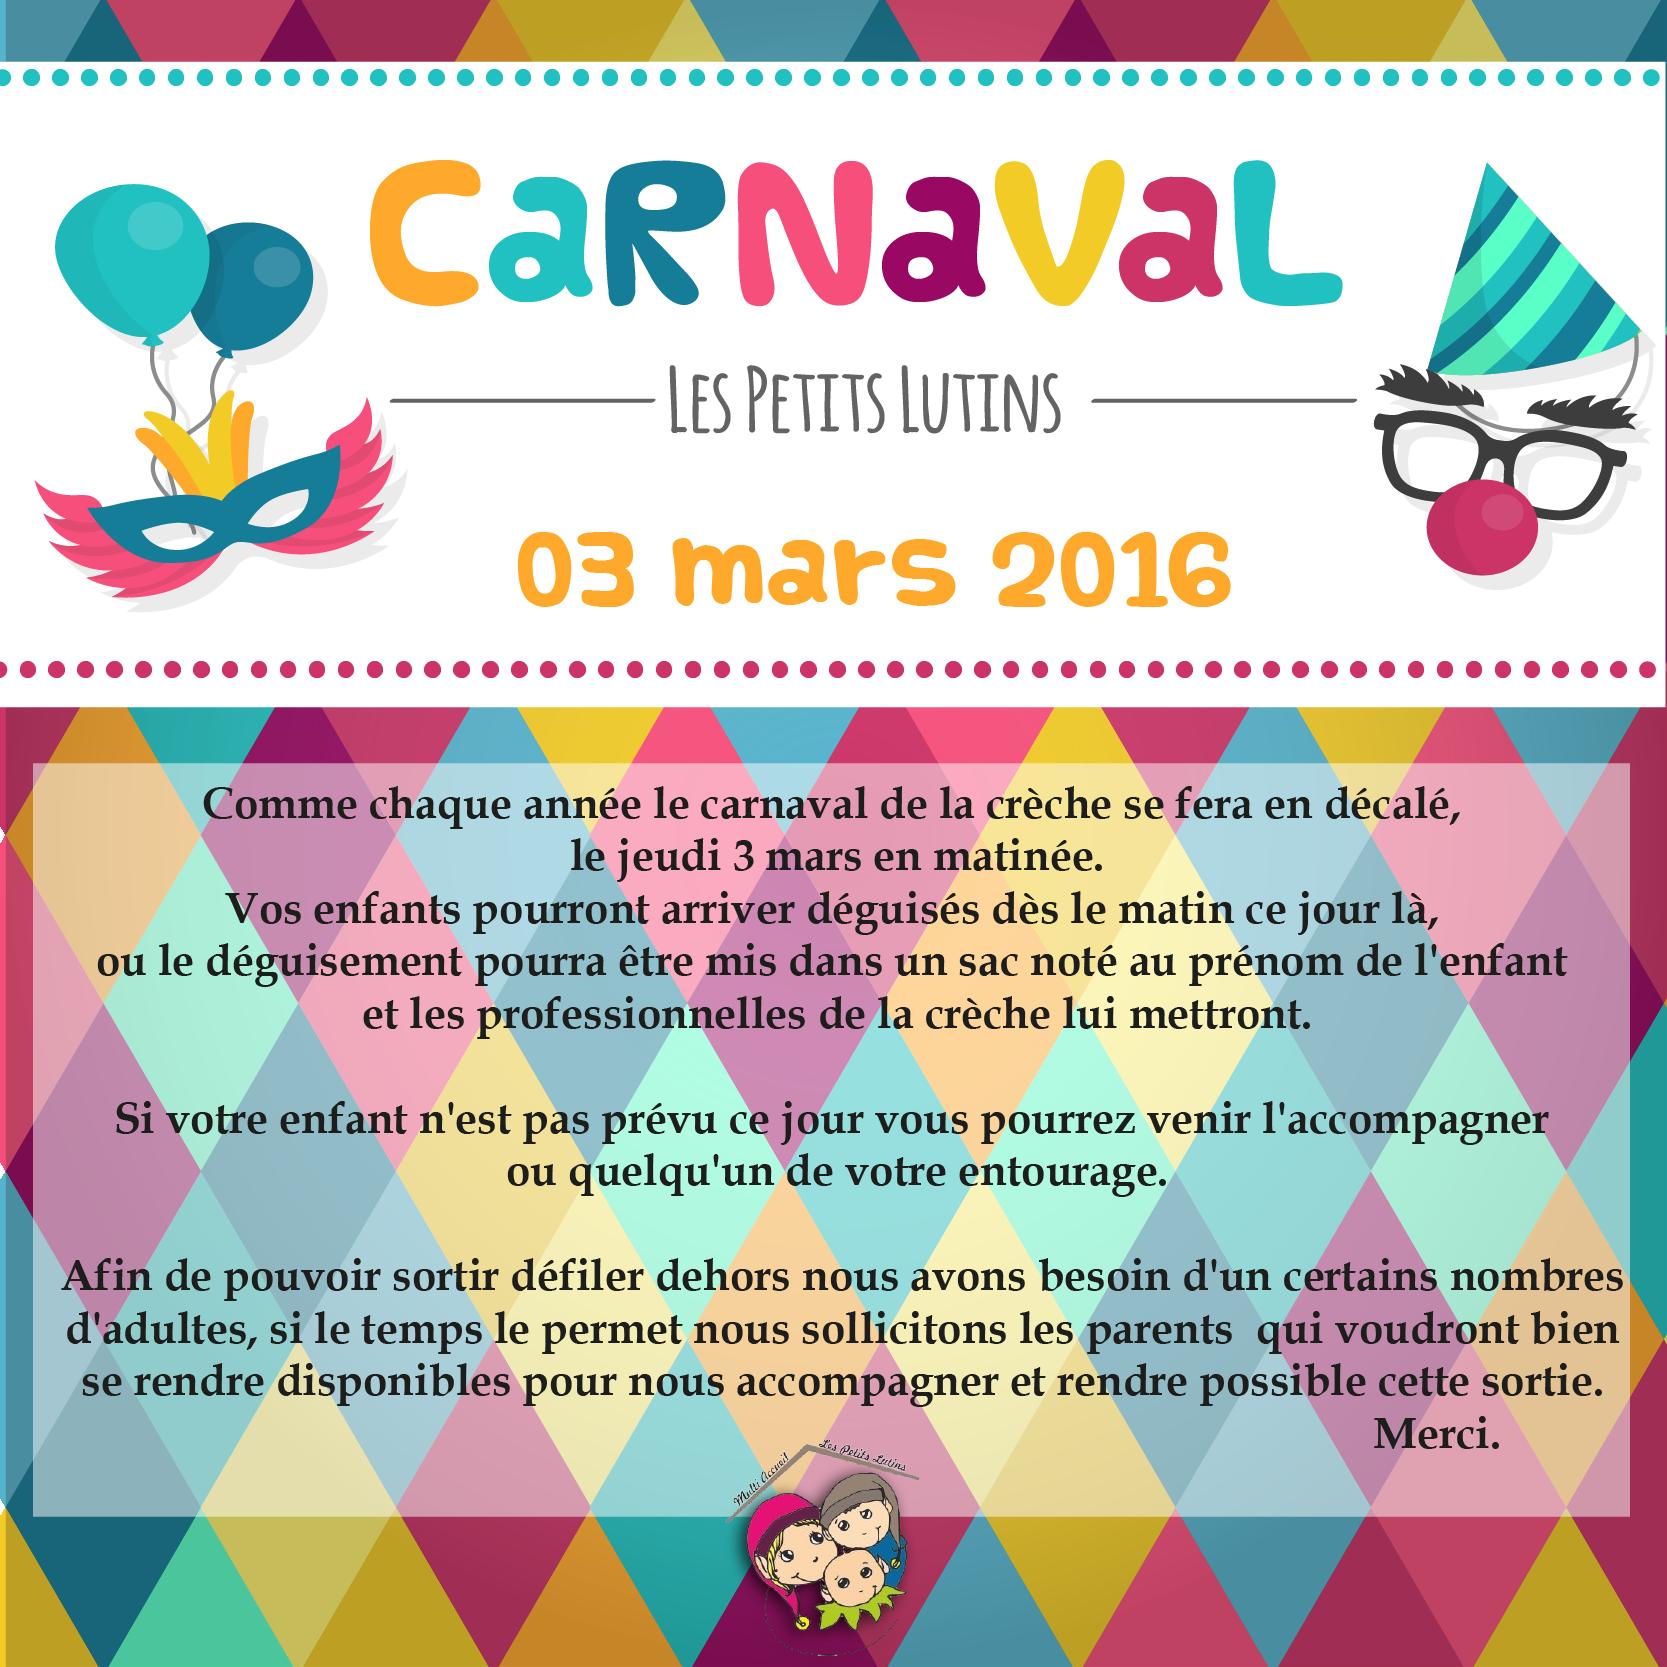 Carnaval des petits Lutins